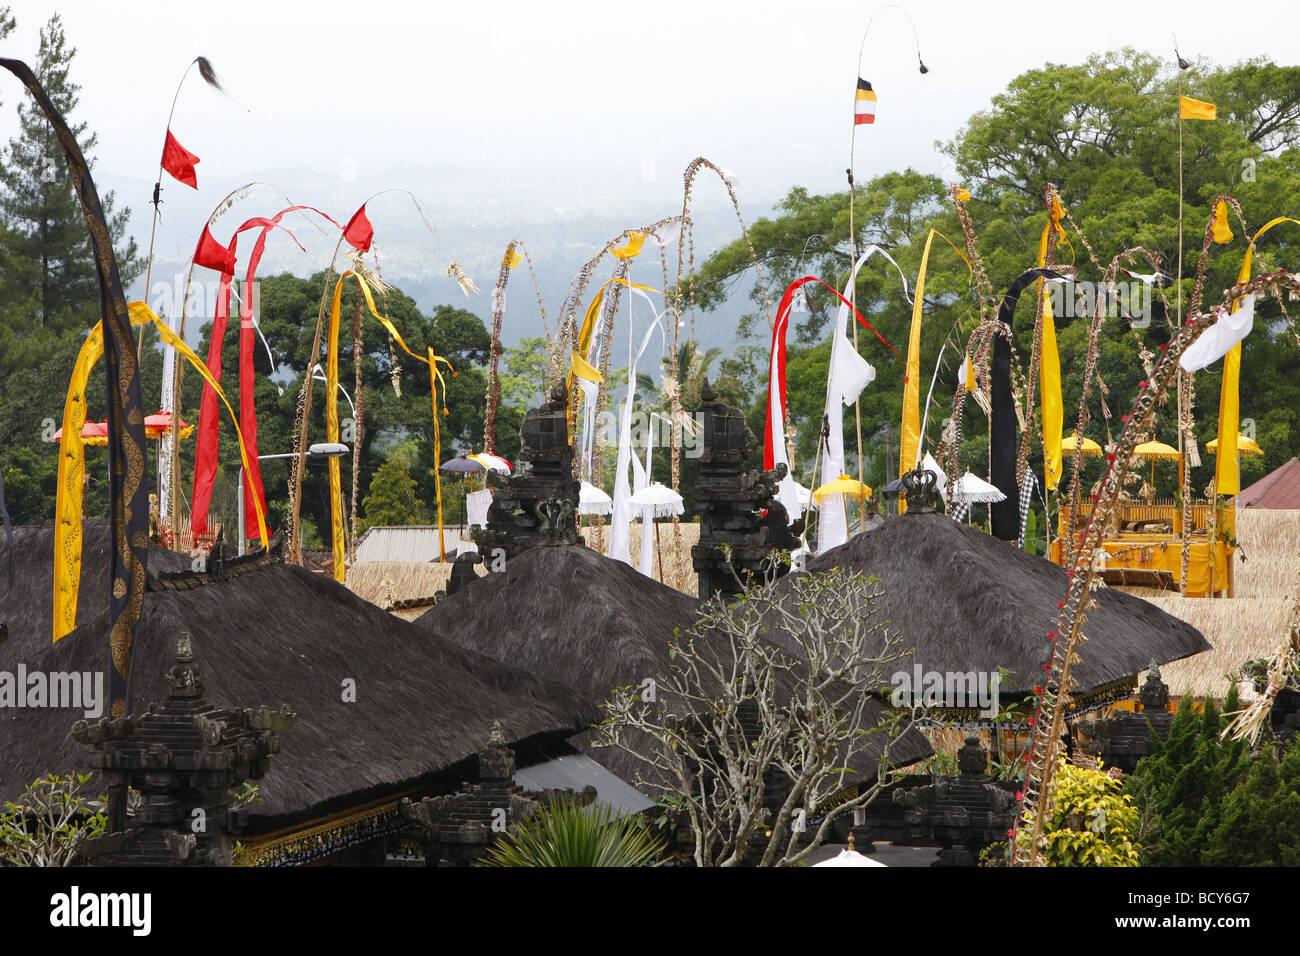 Hindu New Year Festival, Pura Besakhi, held every 10 years, at Agung volcano, 2567m, Bali, Republic of Indonesia, - Stock Image